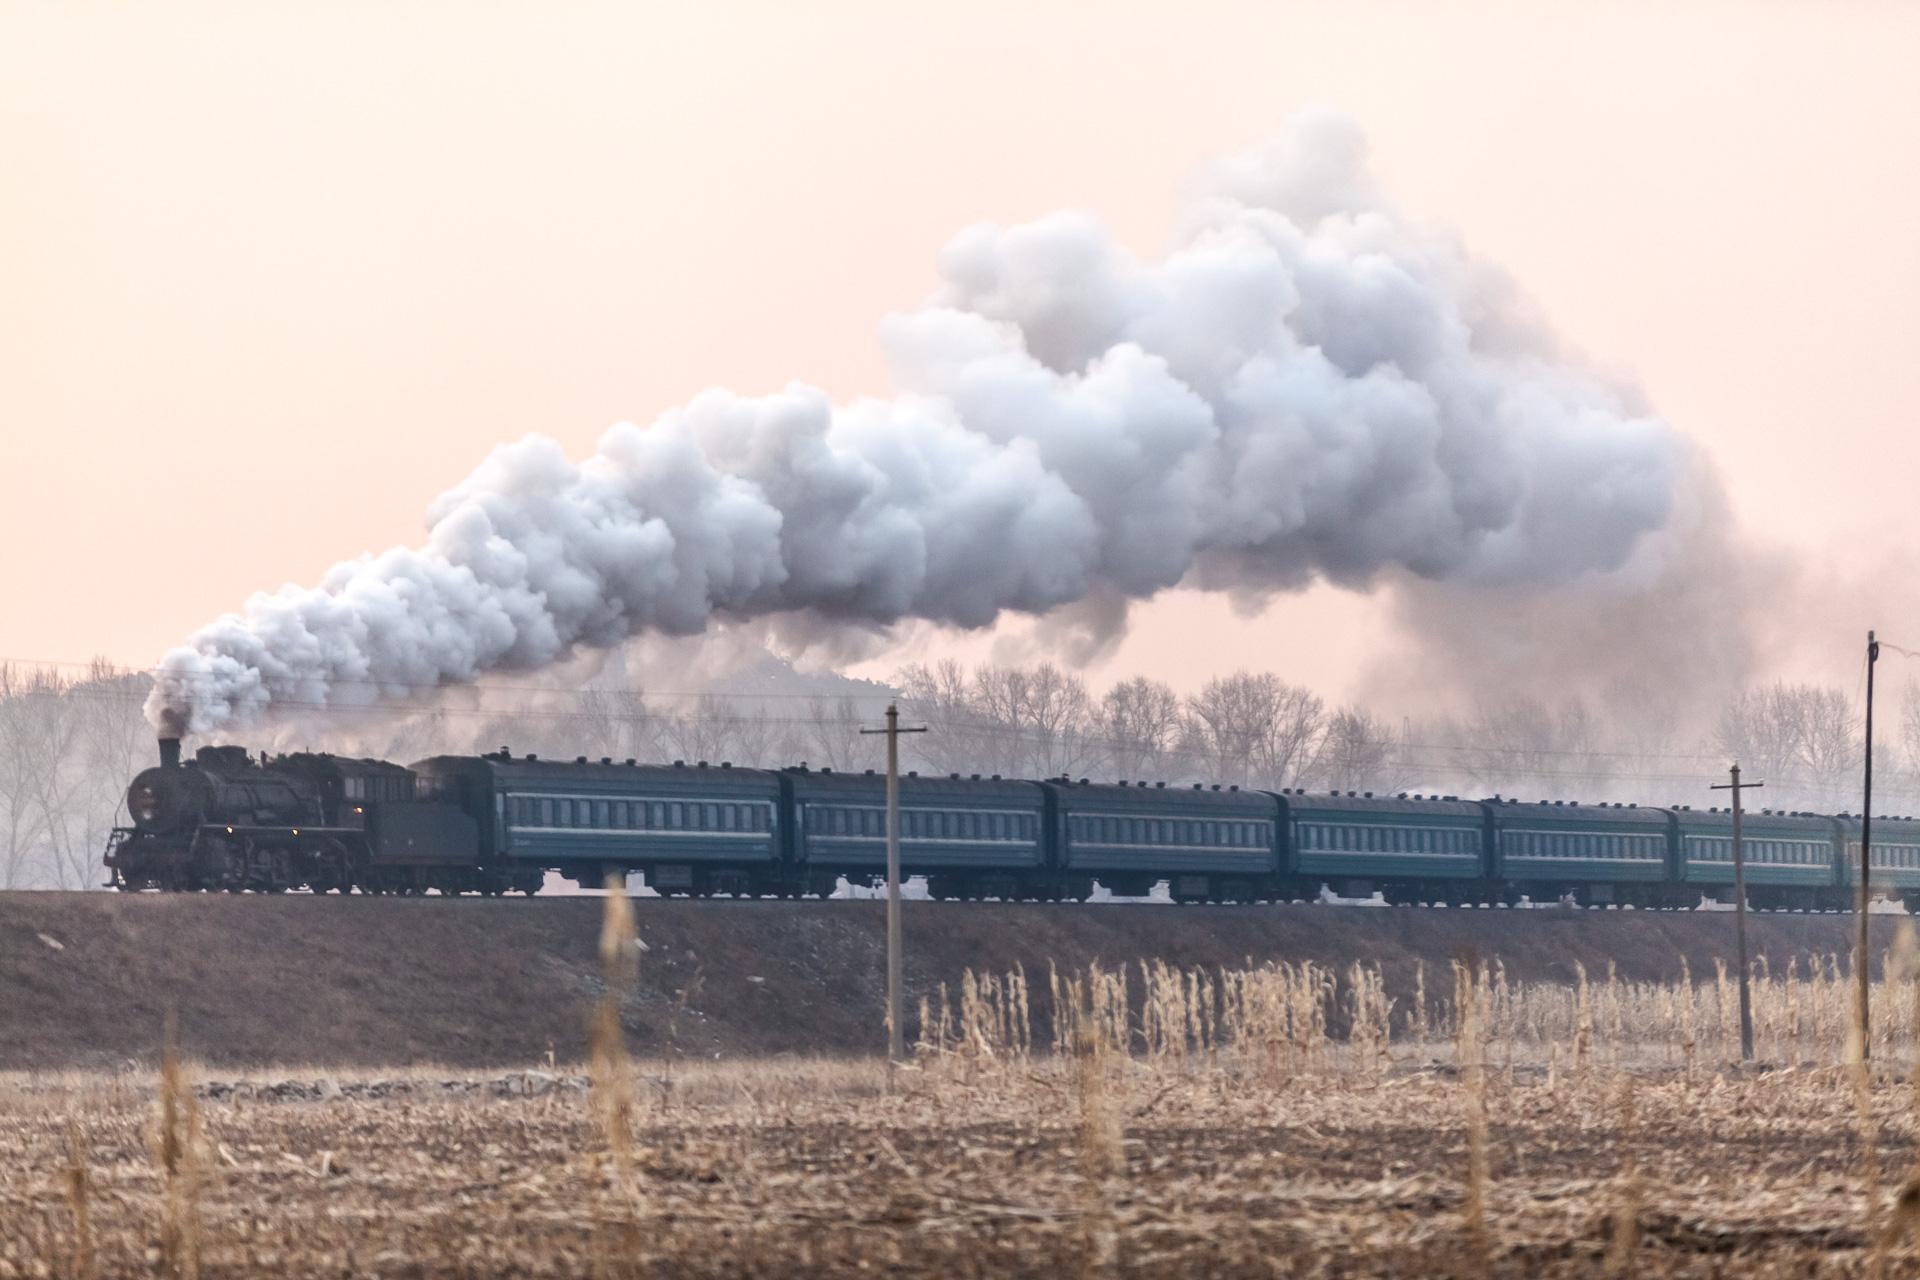 Der Personenzug No. 403 von Diaobingshan nach Dongguatun, Anfang 2014.